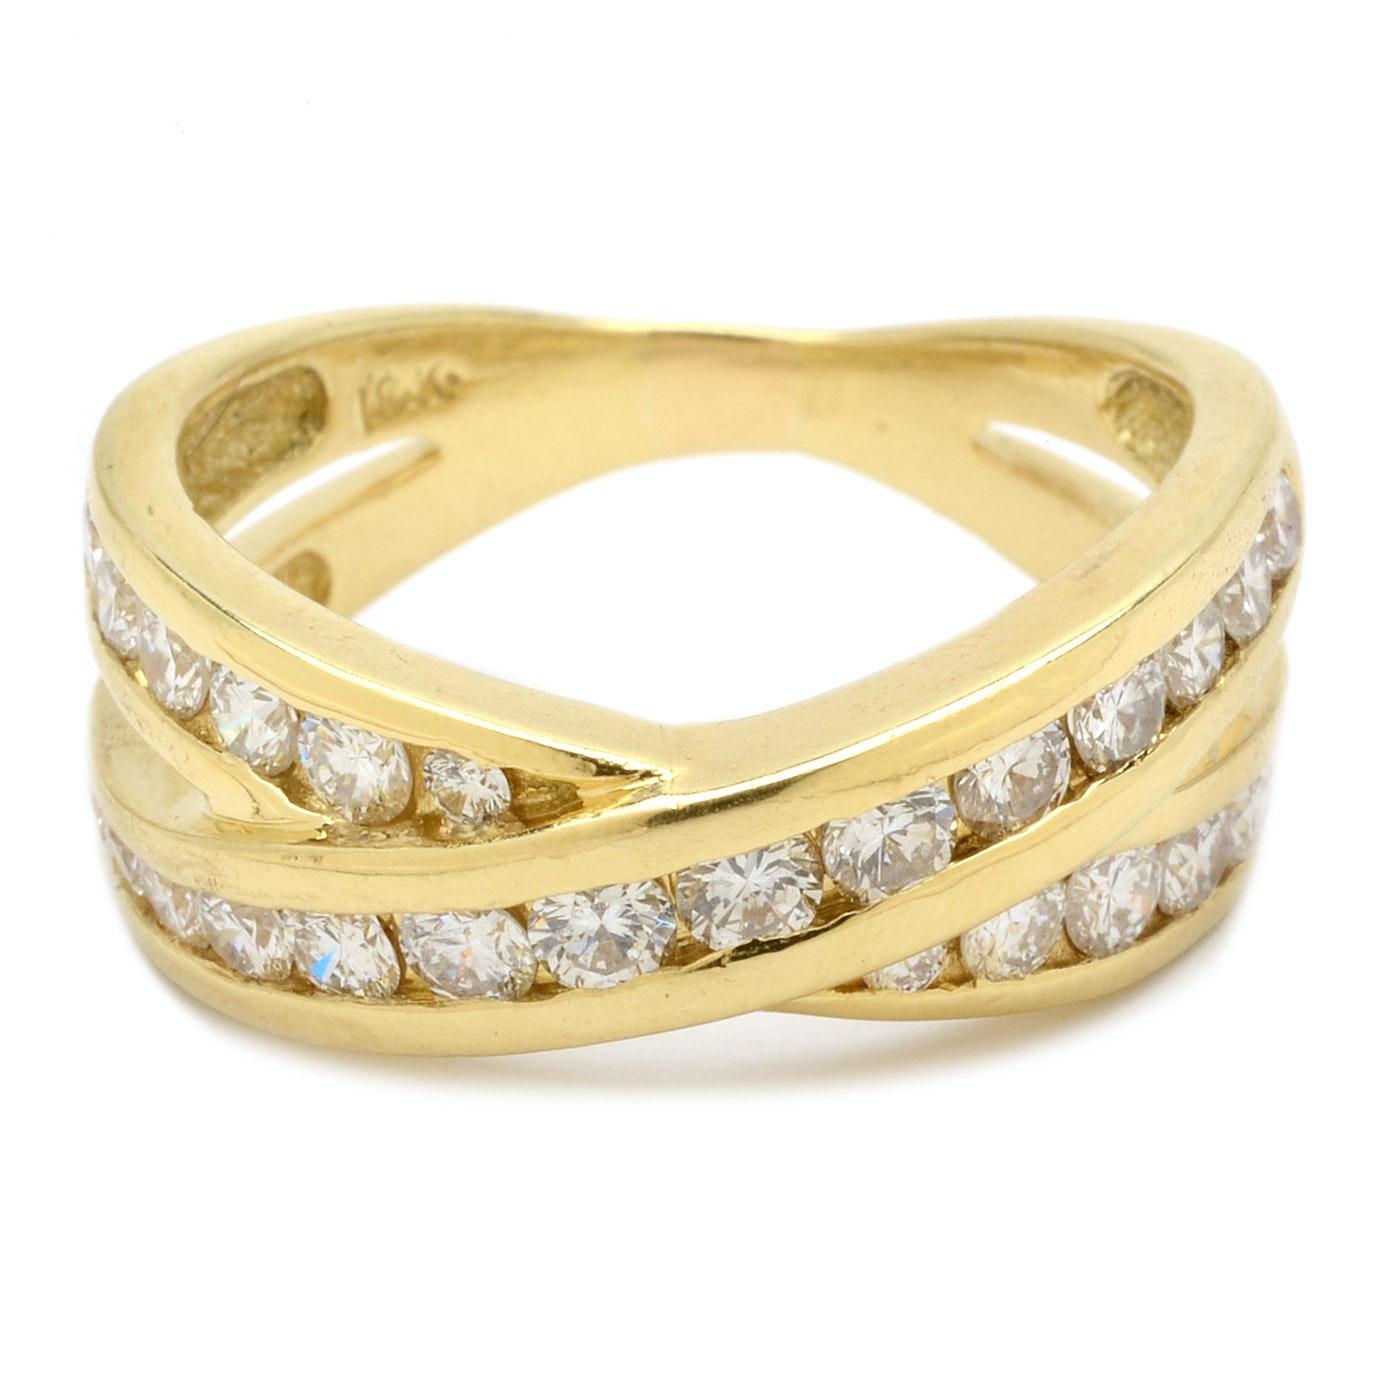 18K Yellow Gold Channel Set Diamond Ring